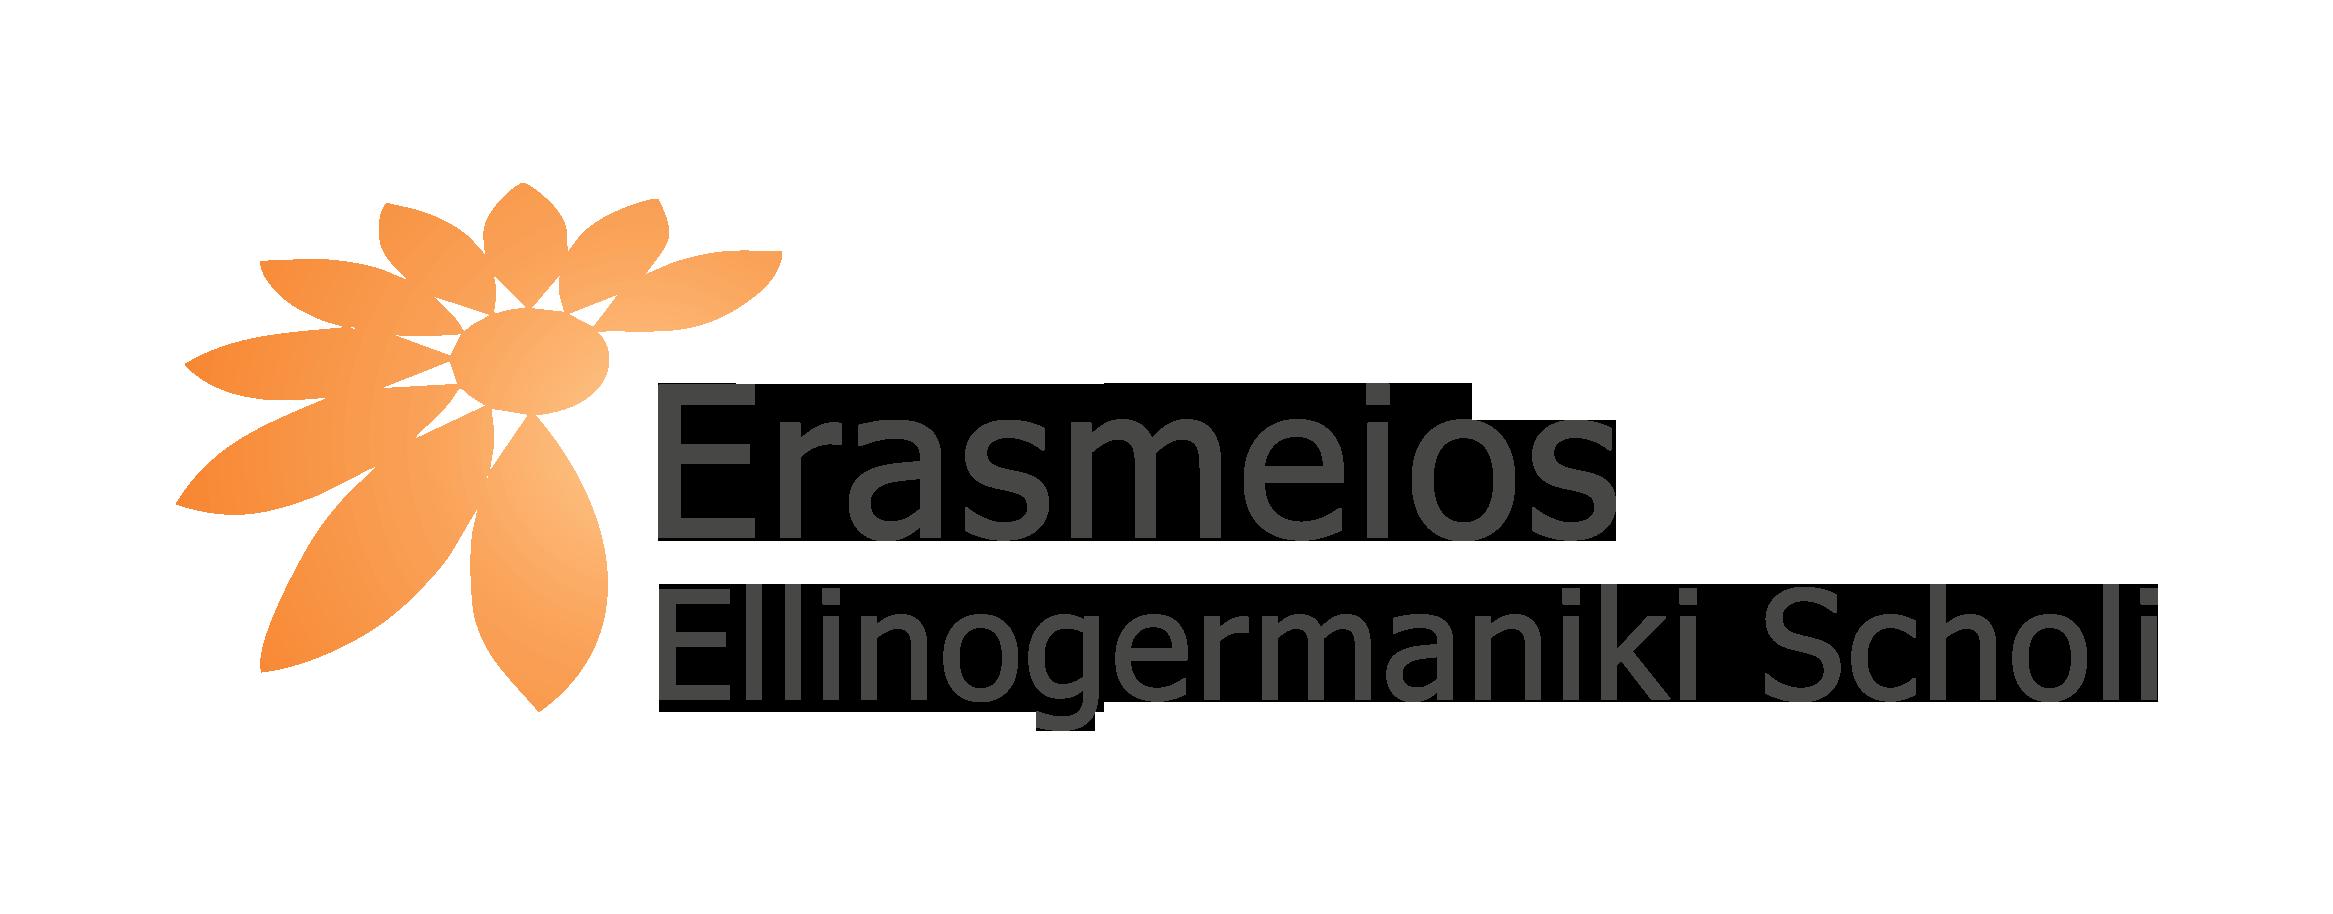 logoERASMIOS ELOT (1) copy.png